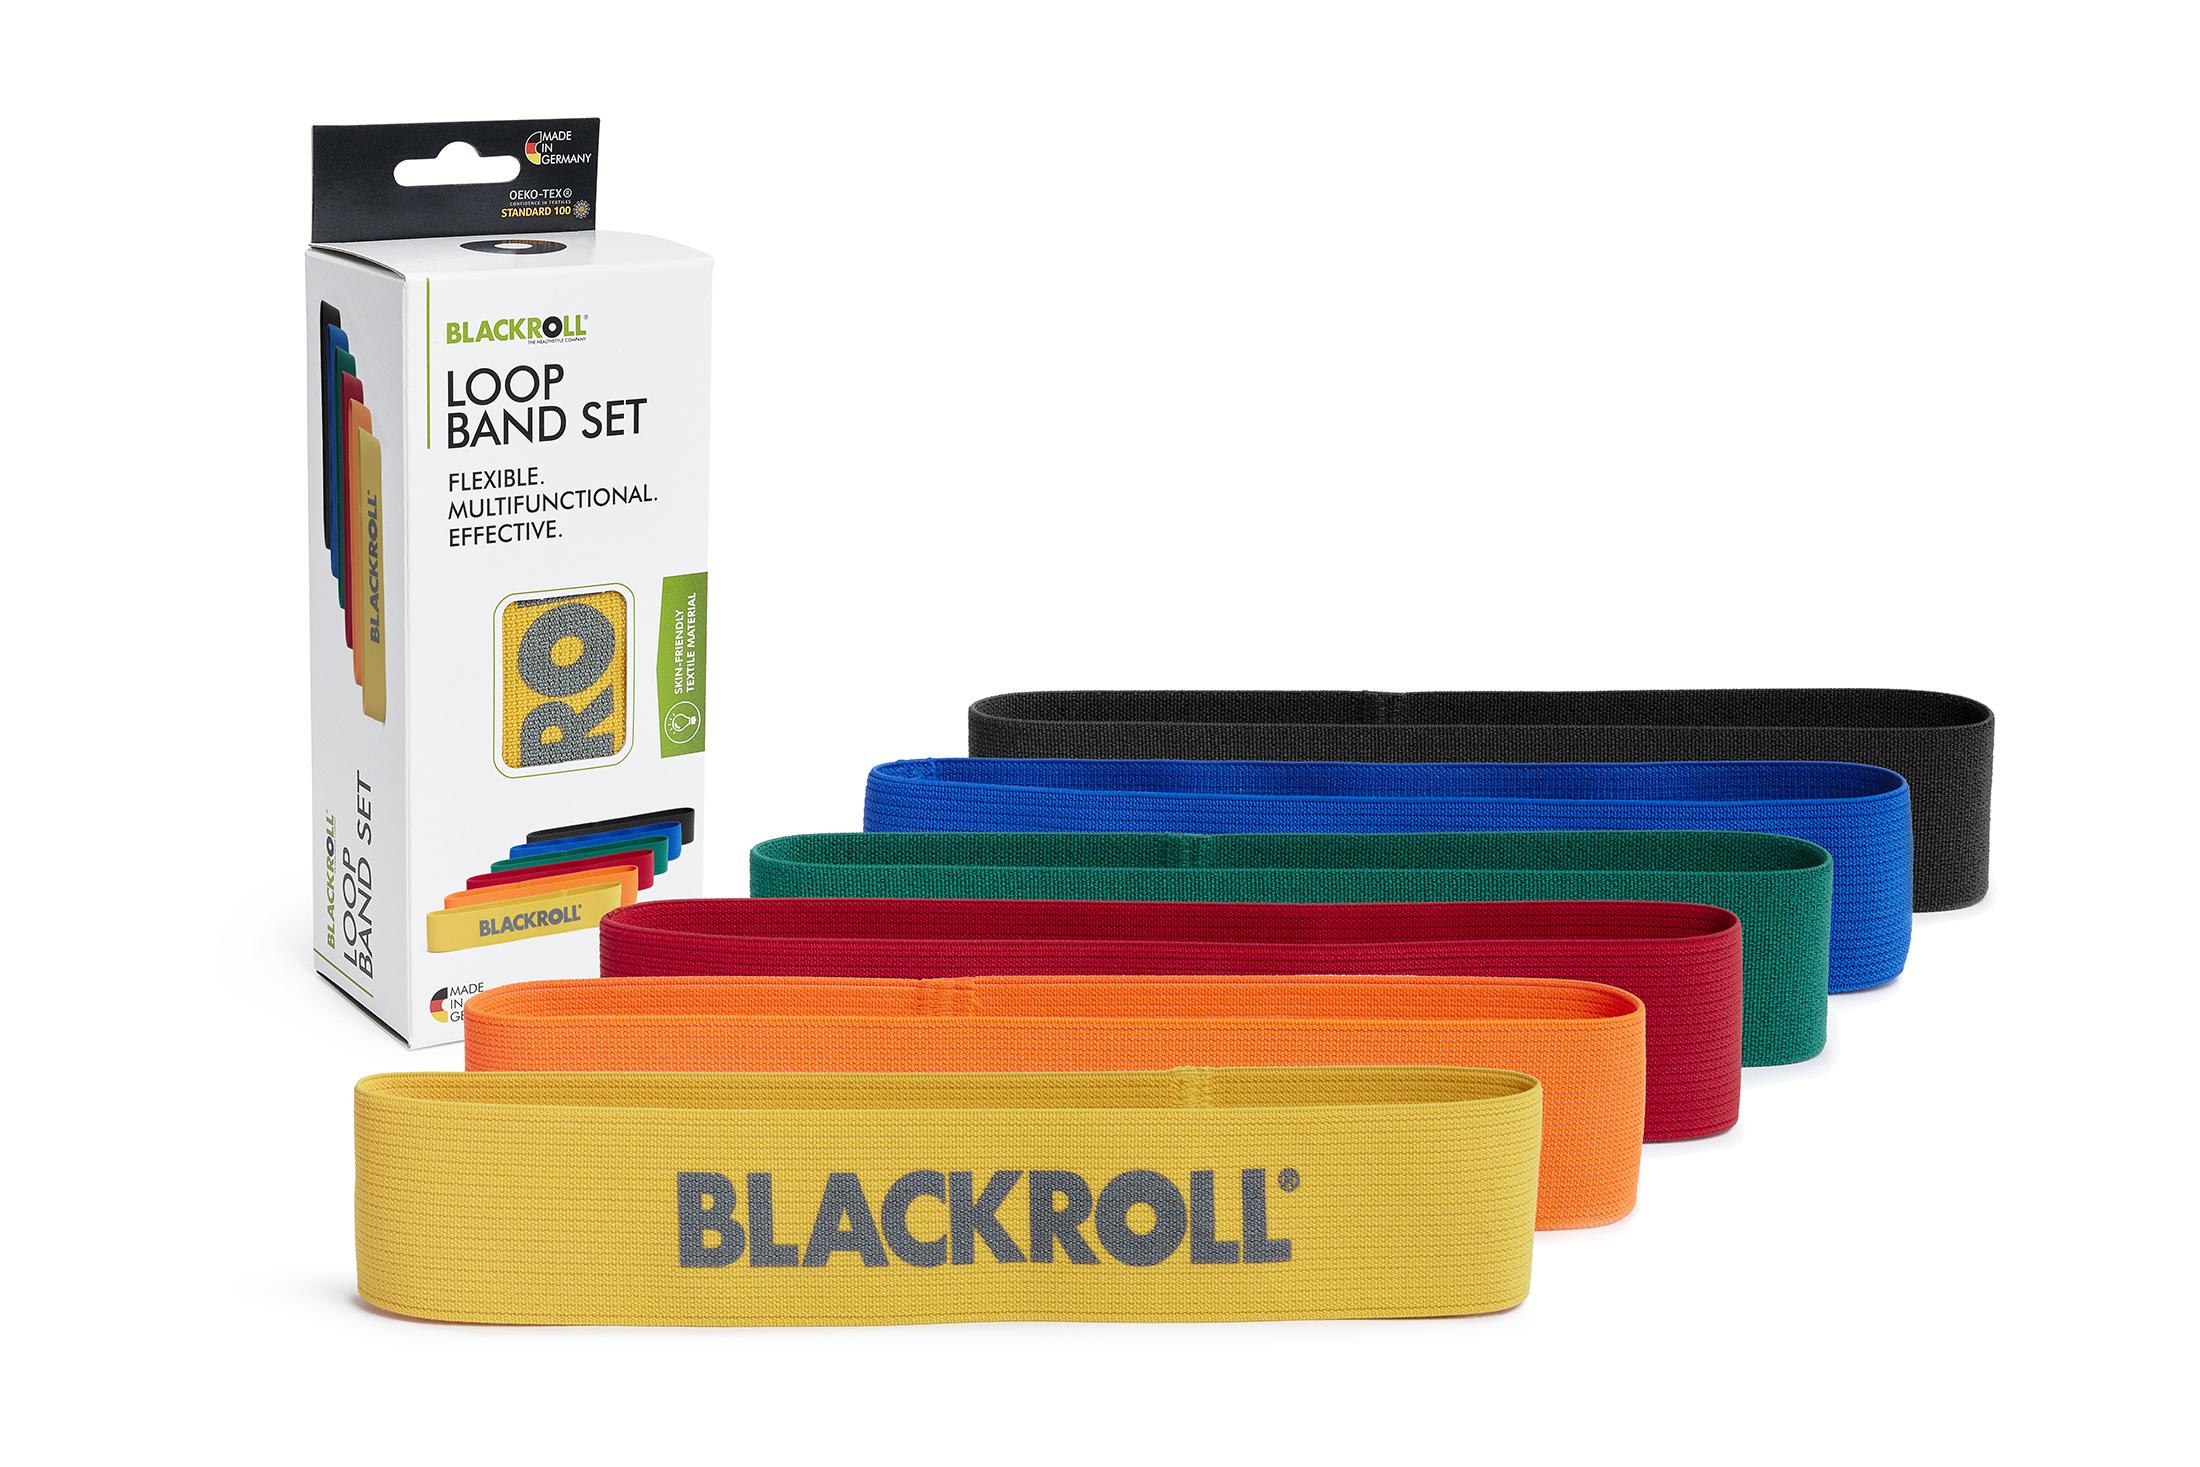 BLACKROLL® LOOP BAND SET 6ER yellow, orange, red, green, blue, black